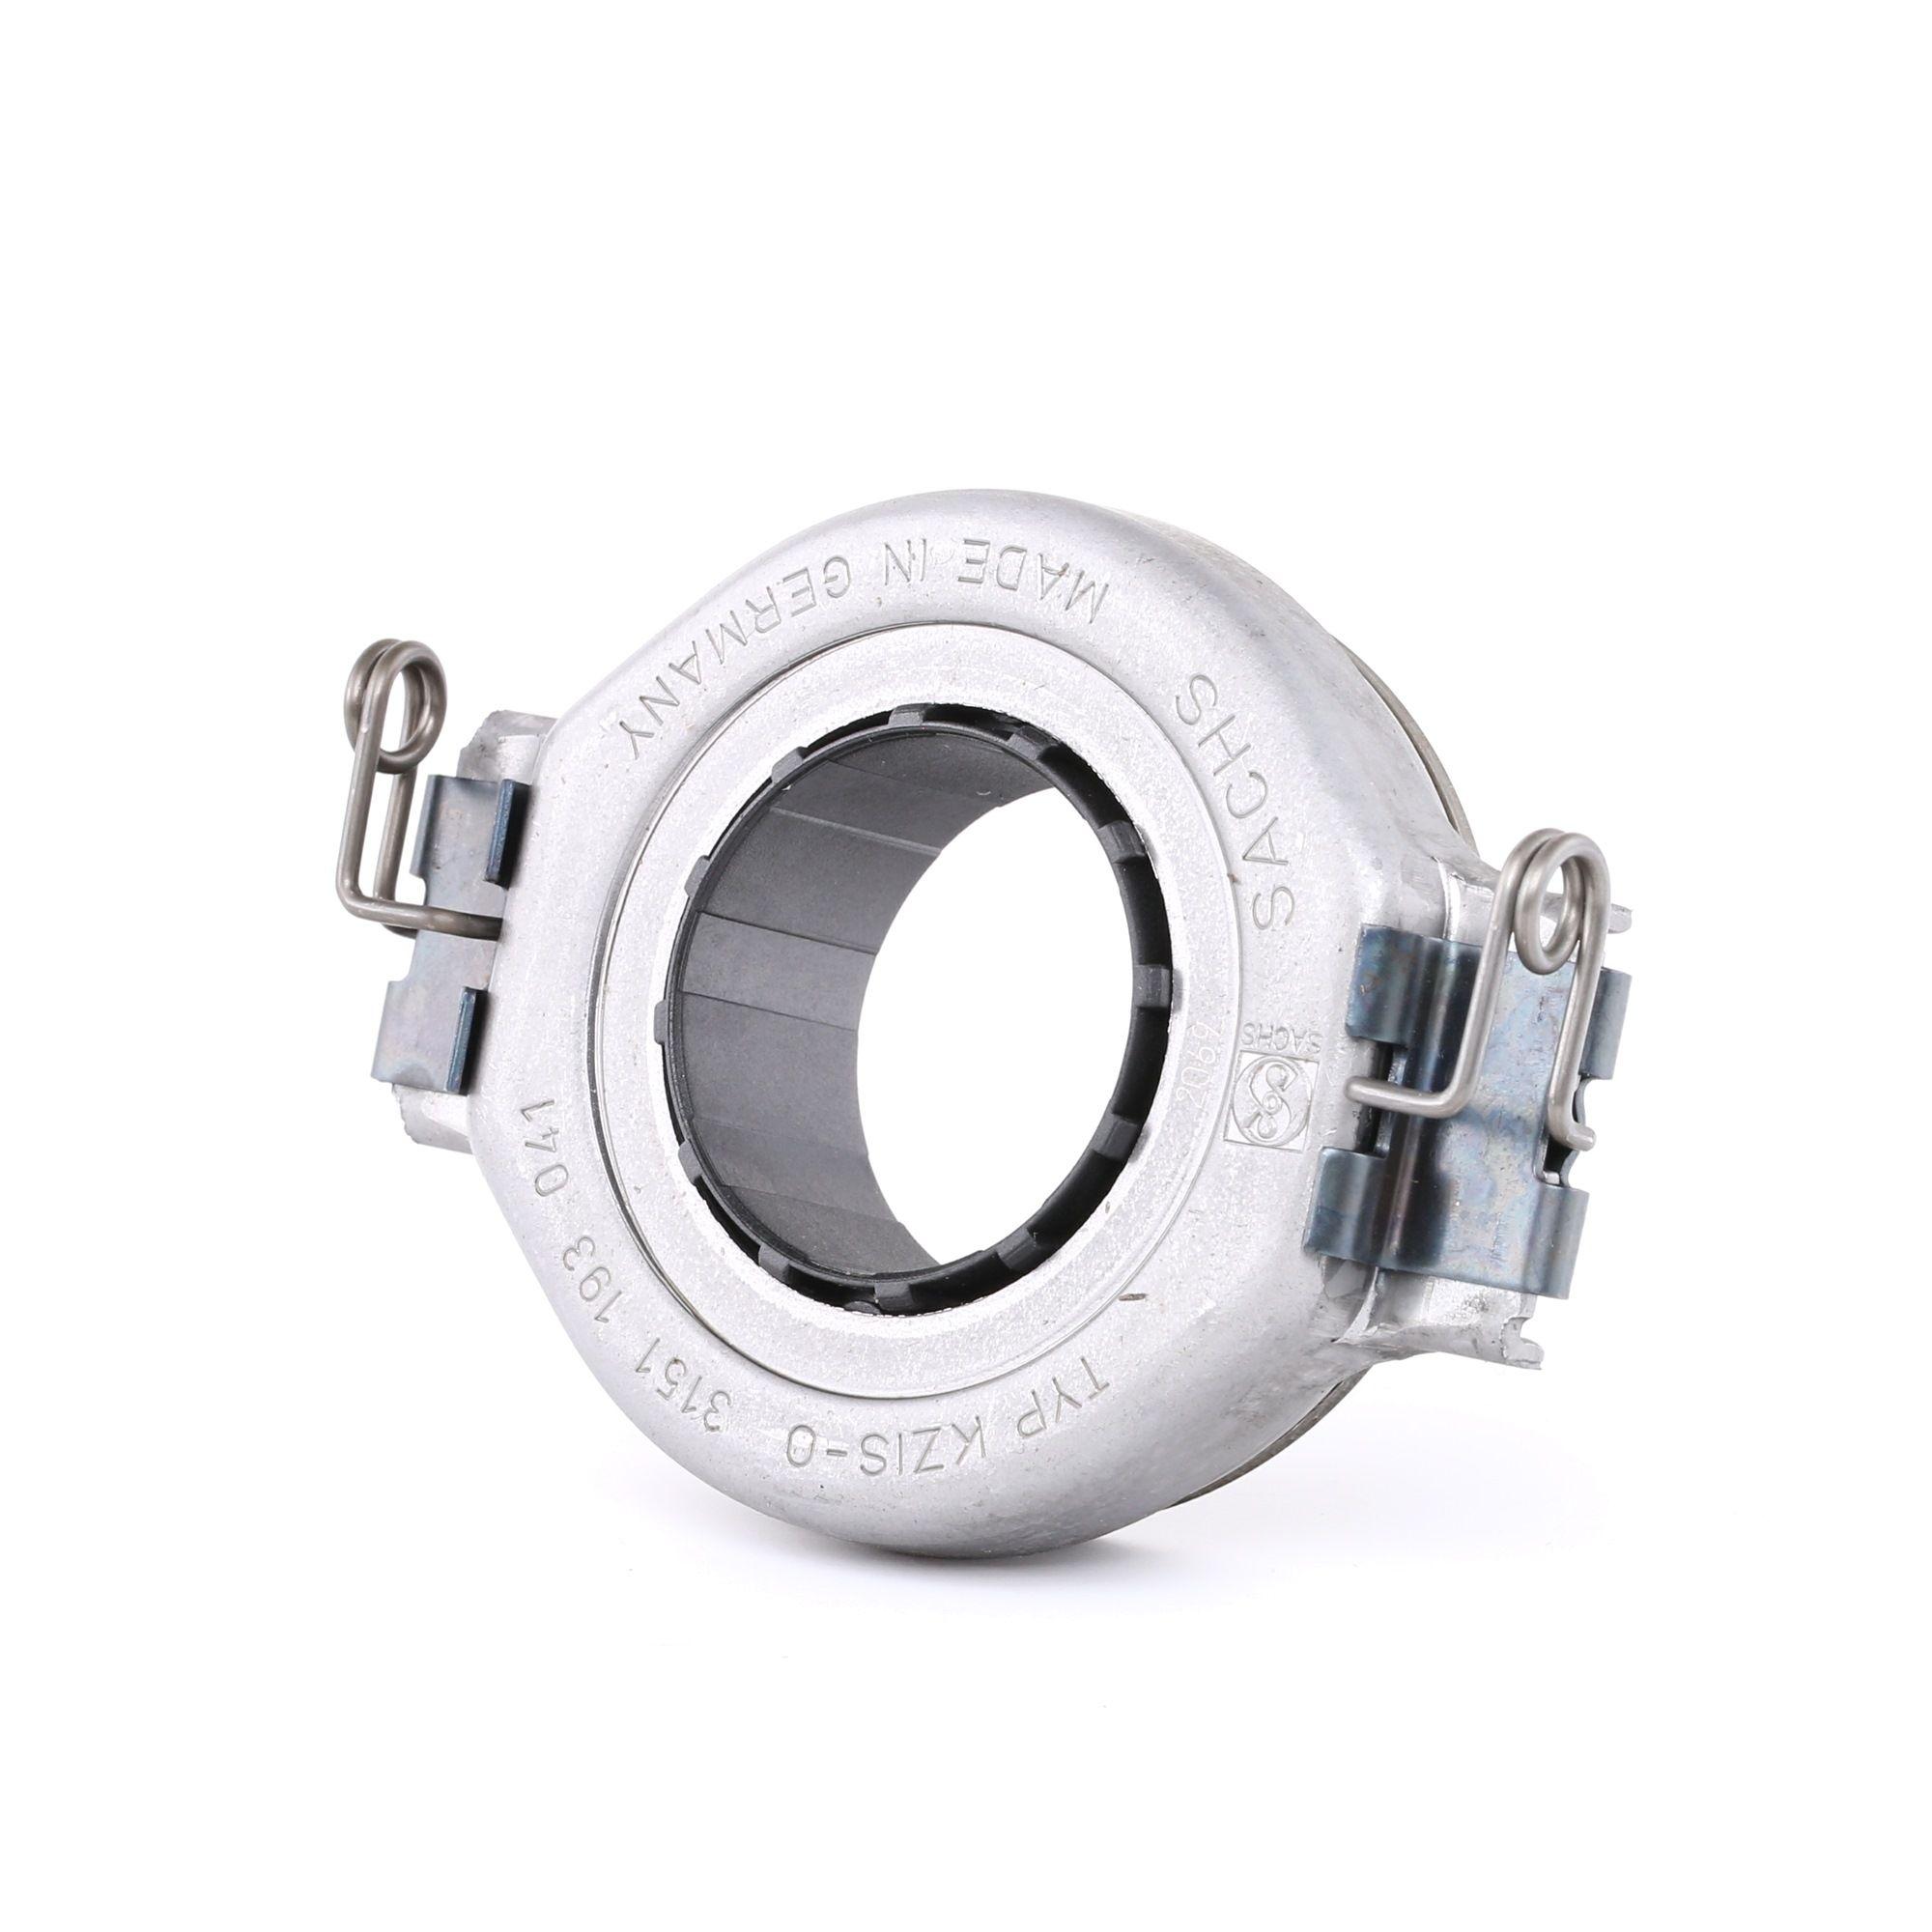 Clutch Bearing SACHS 3151 193 041 rating